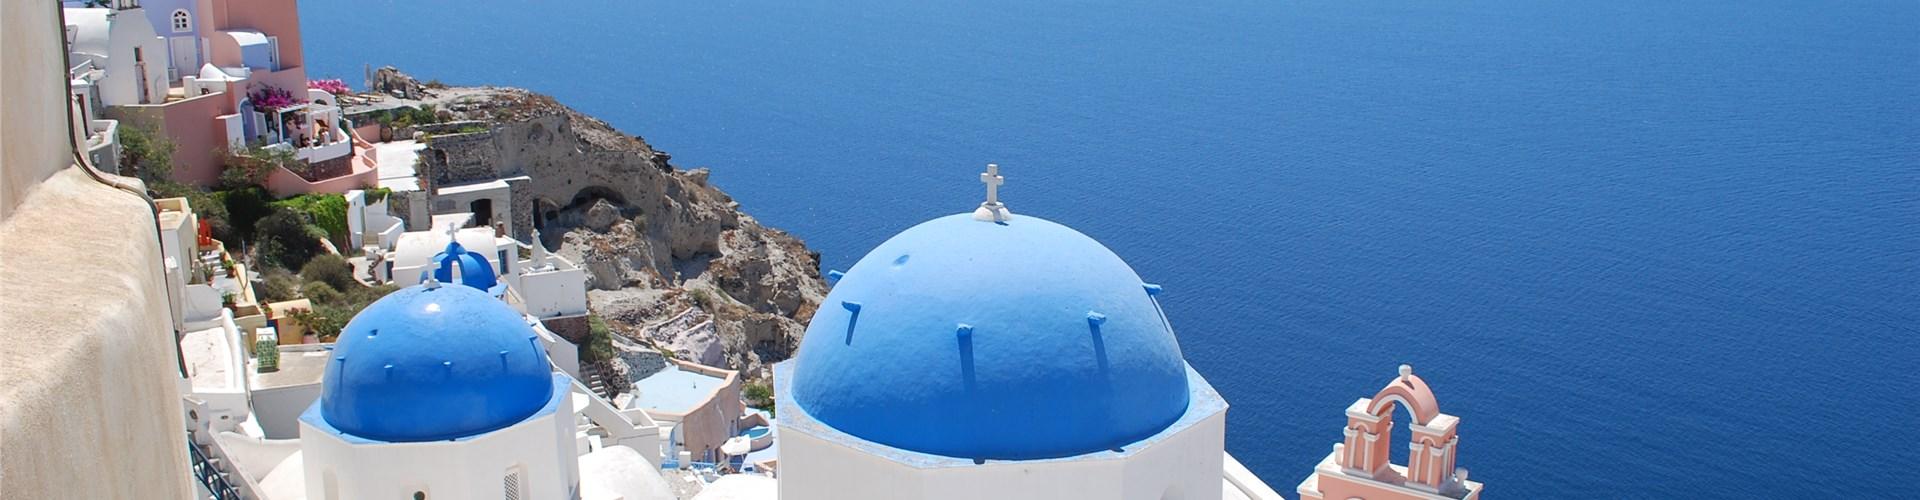 Santorini island in the Aegean sea